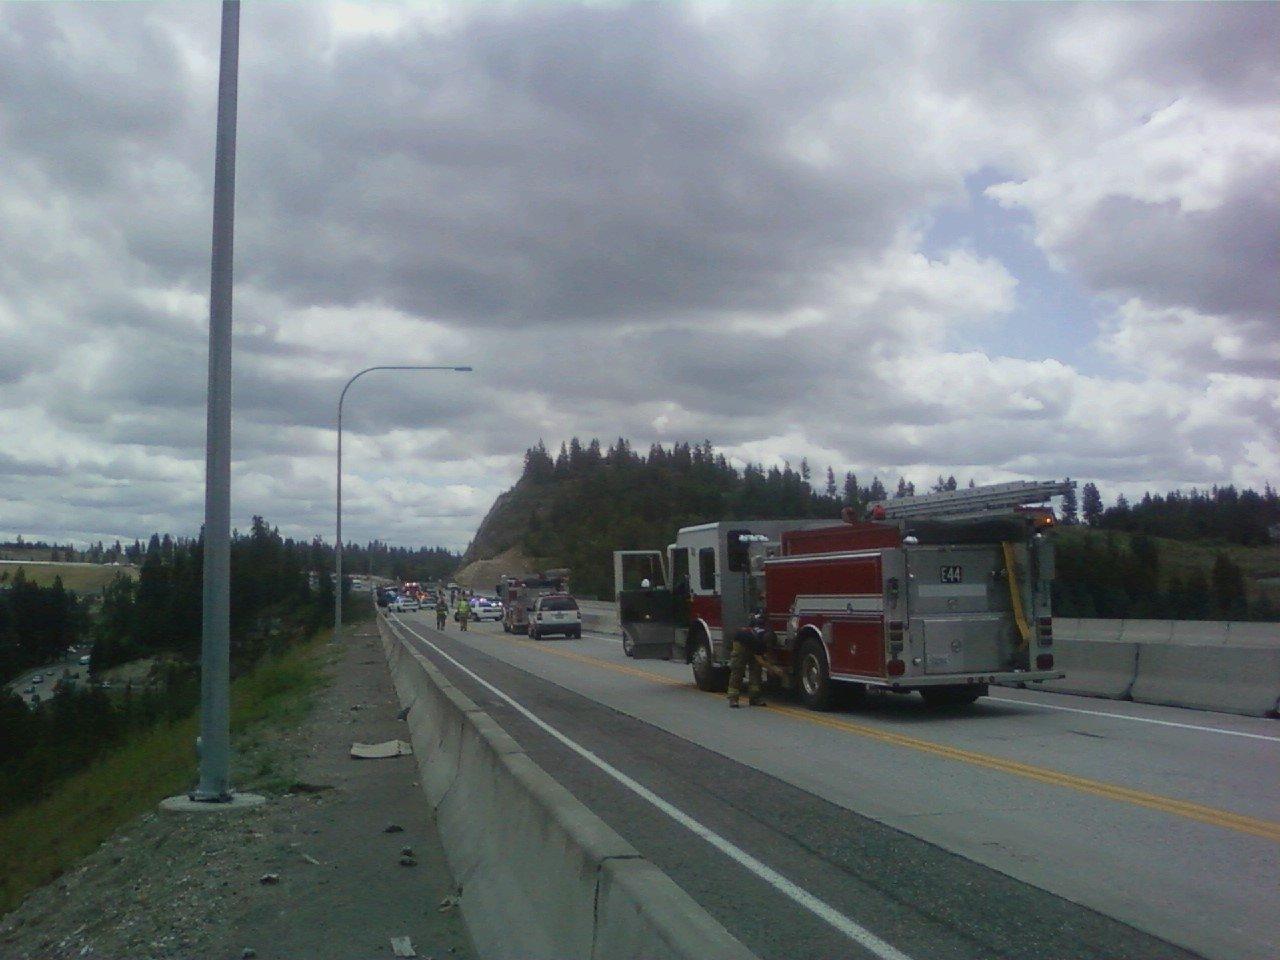 Monday, June 20th: US 395 at Wandermere Bridge